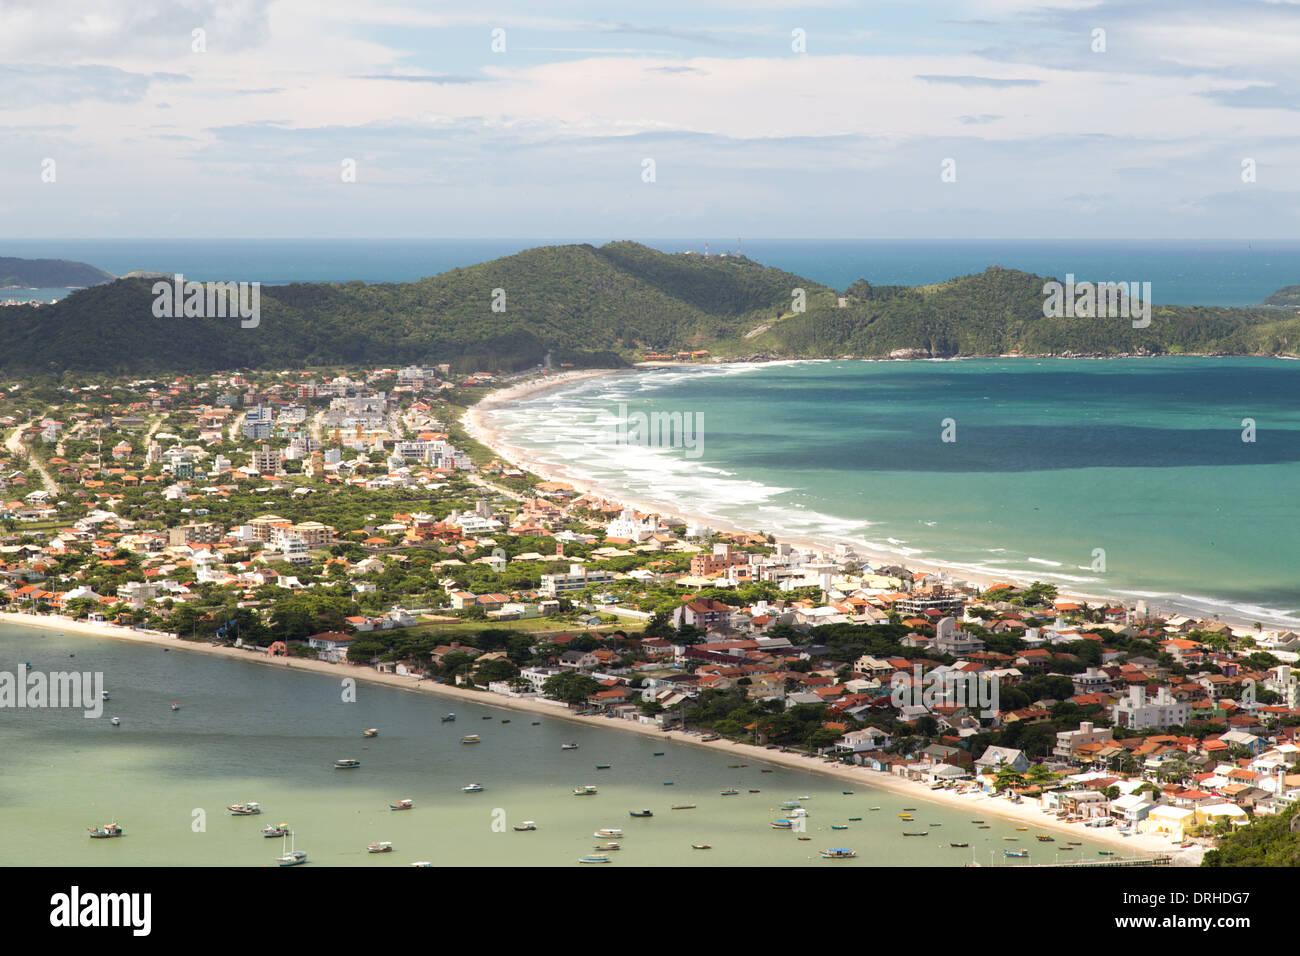 Canto Grande beach, Bombinhas, state of Santa Catarina, Brazil - Stock Image